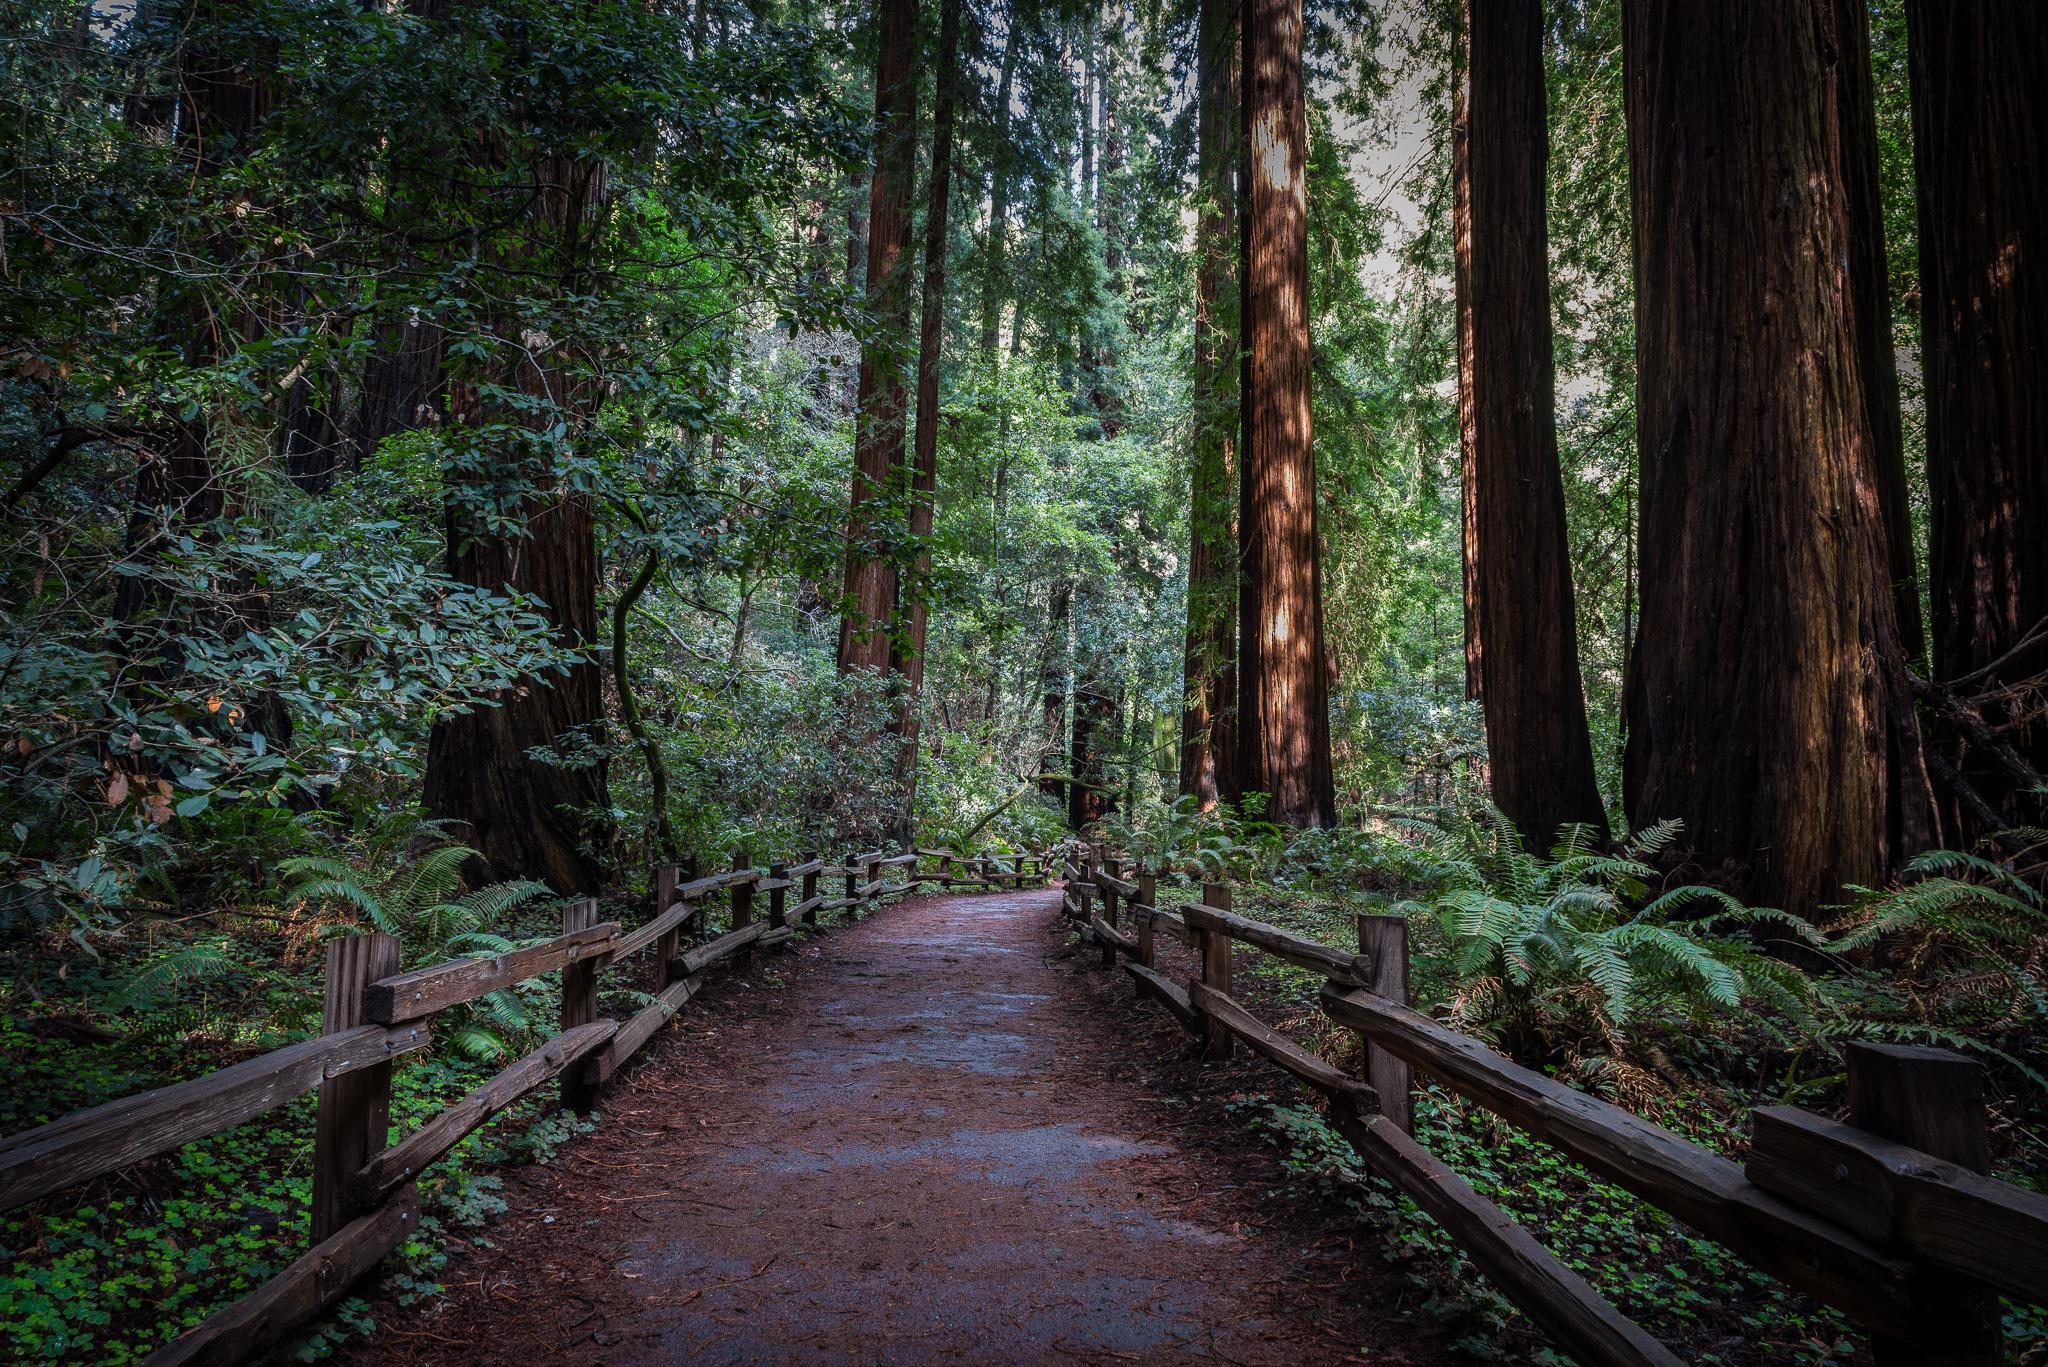 Scott-Davenport-US-California-Marin-Headlands-2016-01-24-0003-.jpg